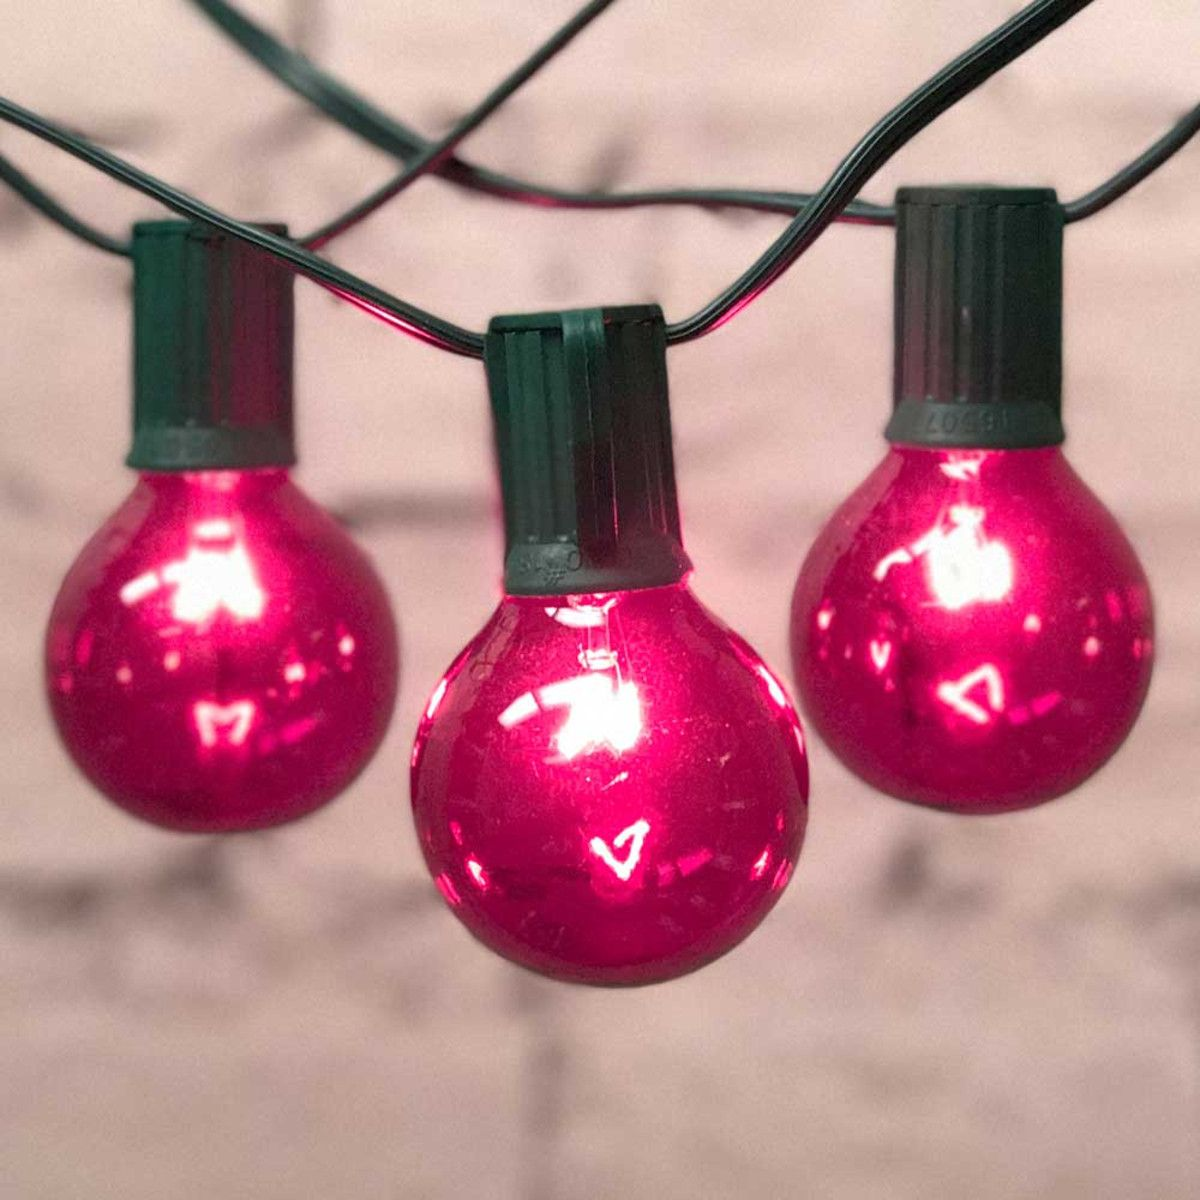 Pink String Lights 25 Green C9 Cord G50 Bulbs Partylights Globe Lights Patio String Lights String Lights Party